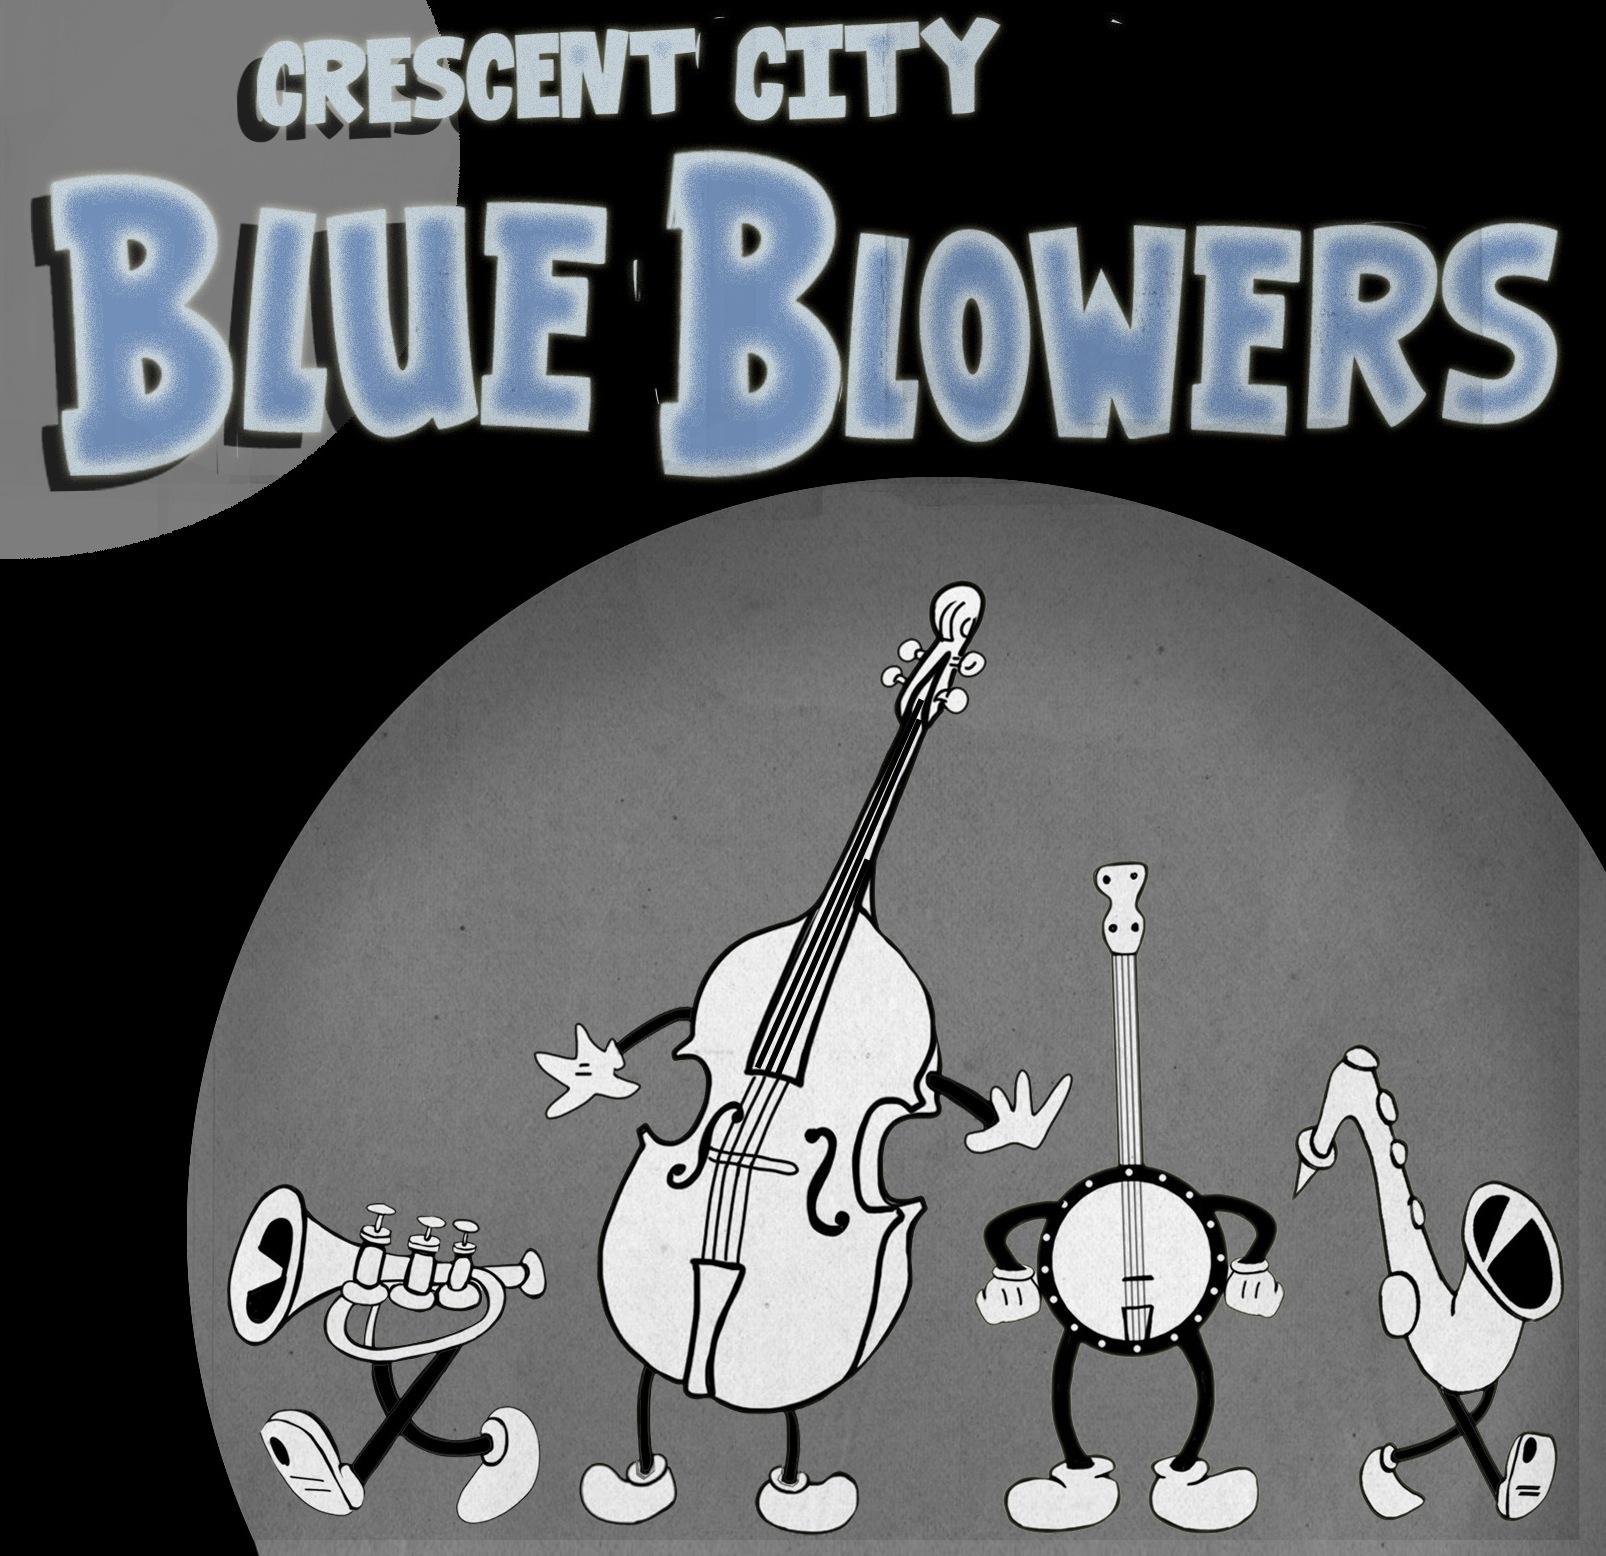 Crescent City Blue Blowers